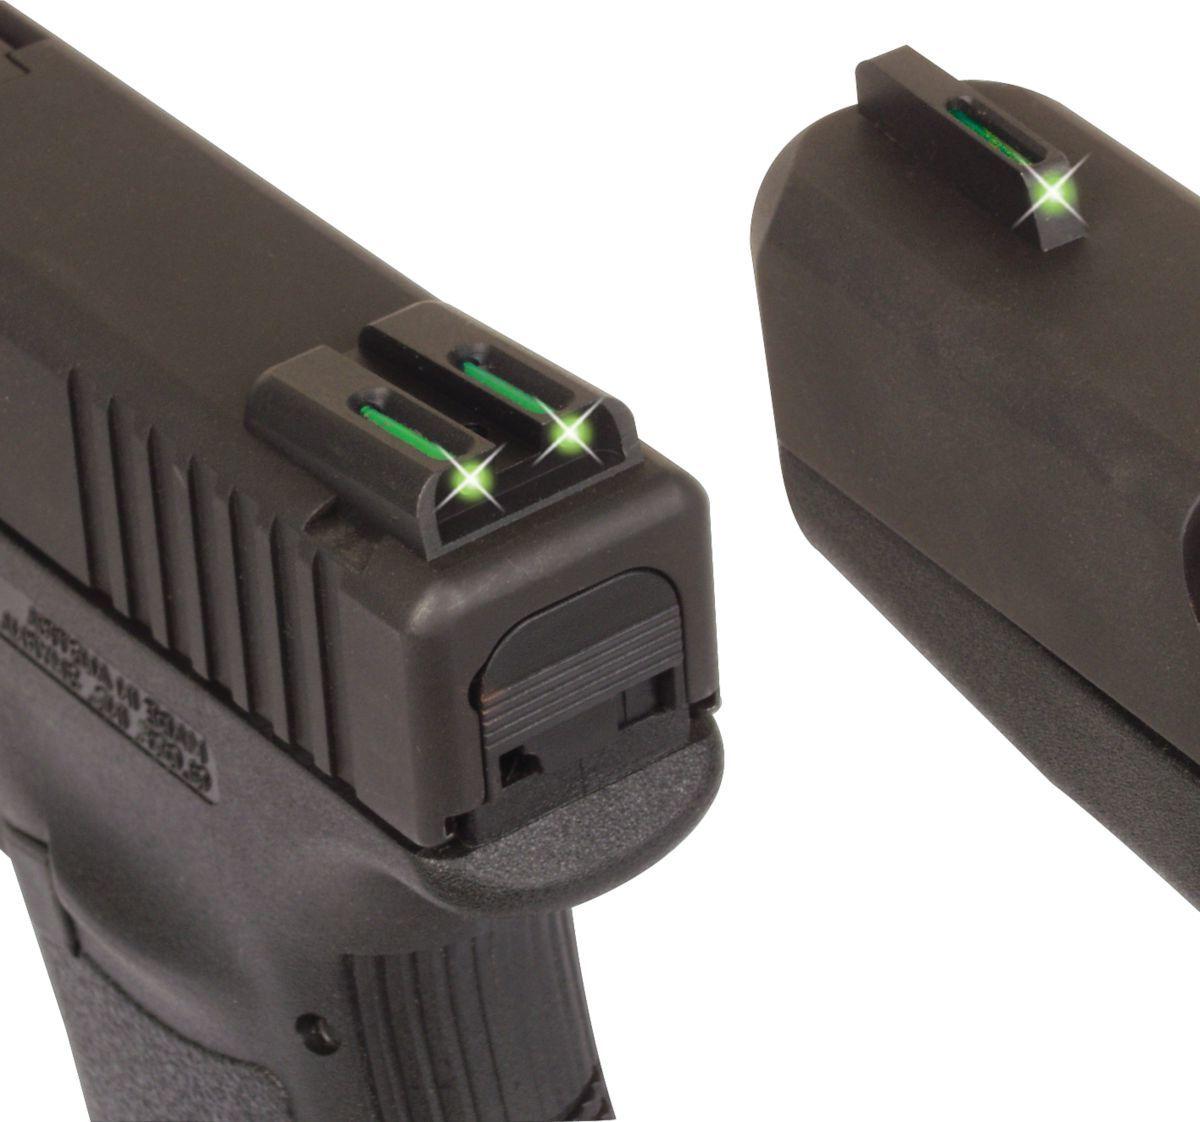 TRUGLO® Tritium Fiber-Optic Pistol Sights